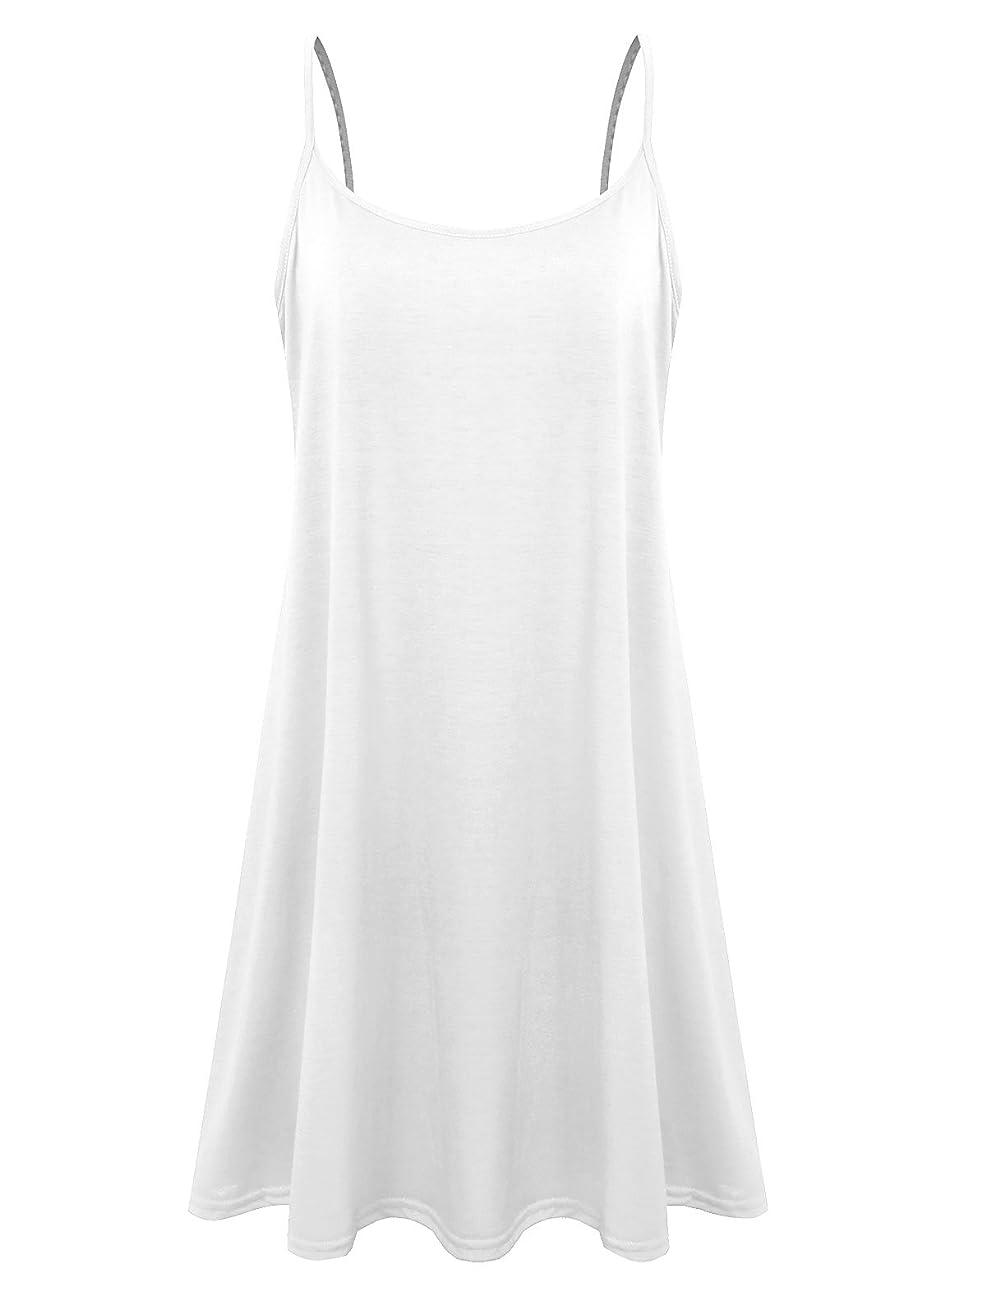 7th Element Plus Size Women's Casual Spaghetti Loose Swing Slip Summer Dress Sundress